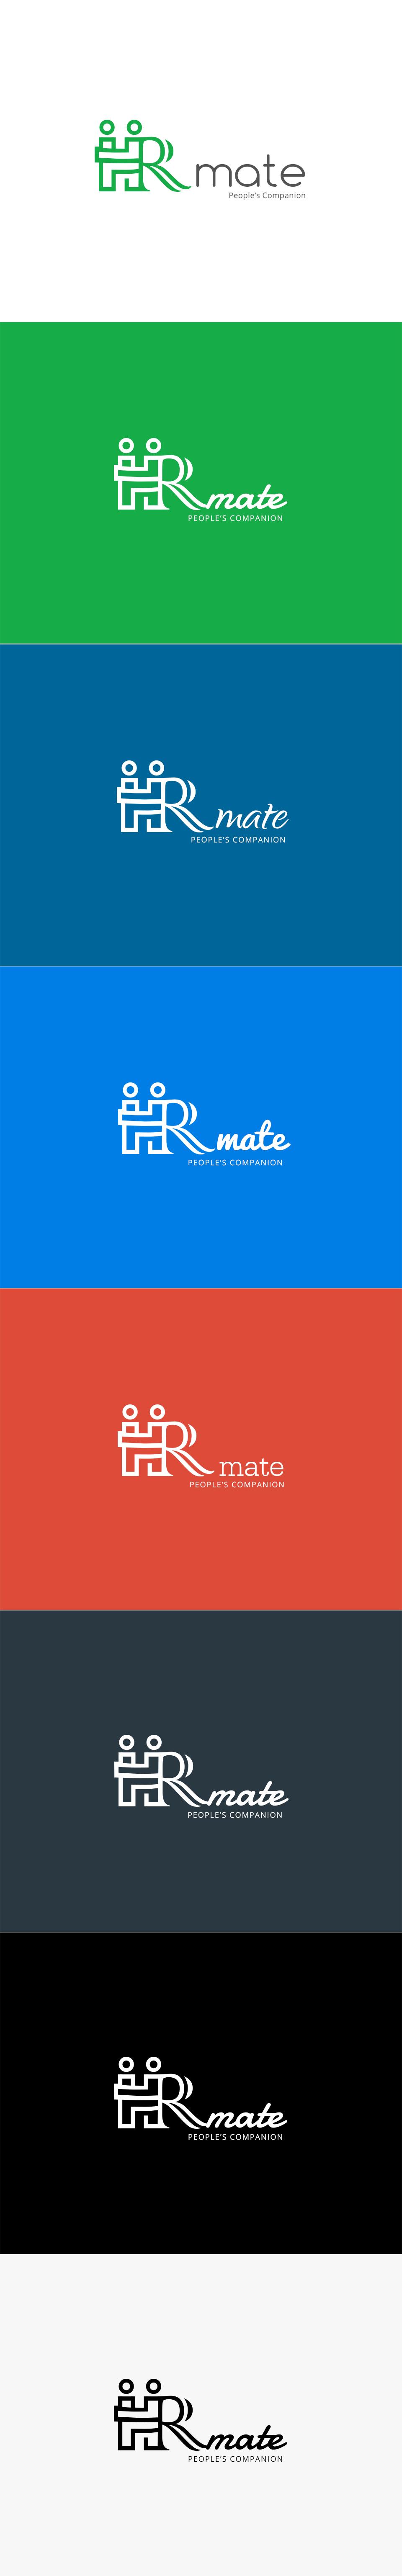 HR mate Logo - Created by: Hariswebdesign, Haris Karat, Webdesigner, Creative Logo :: www.harisw.com